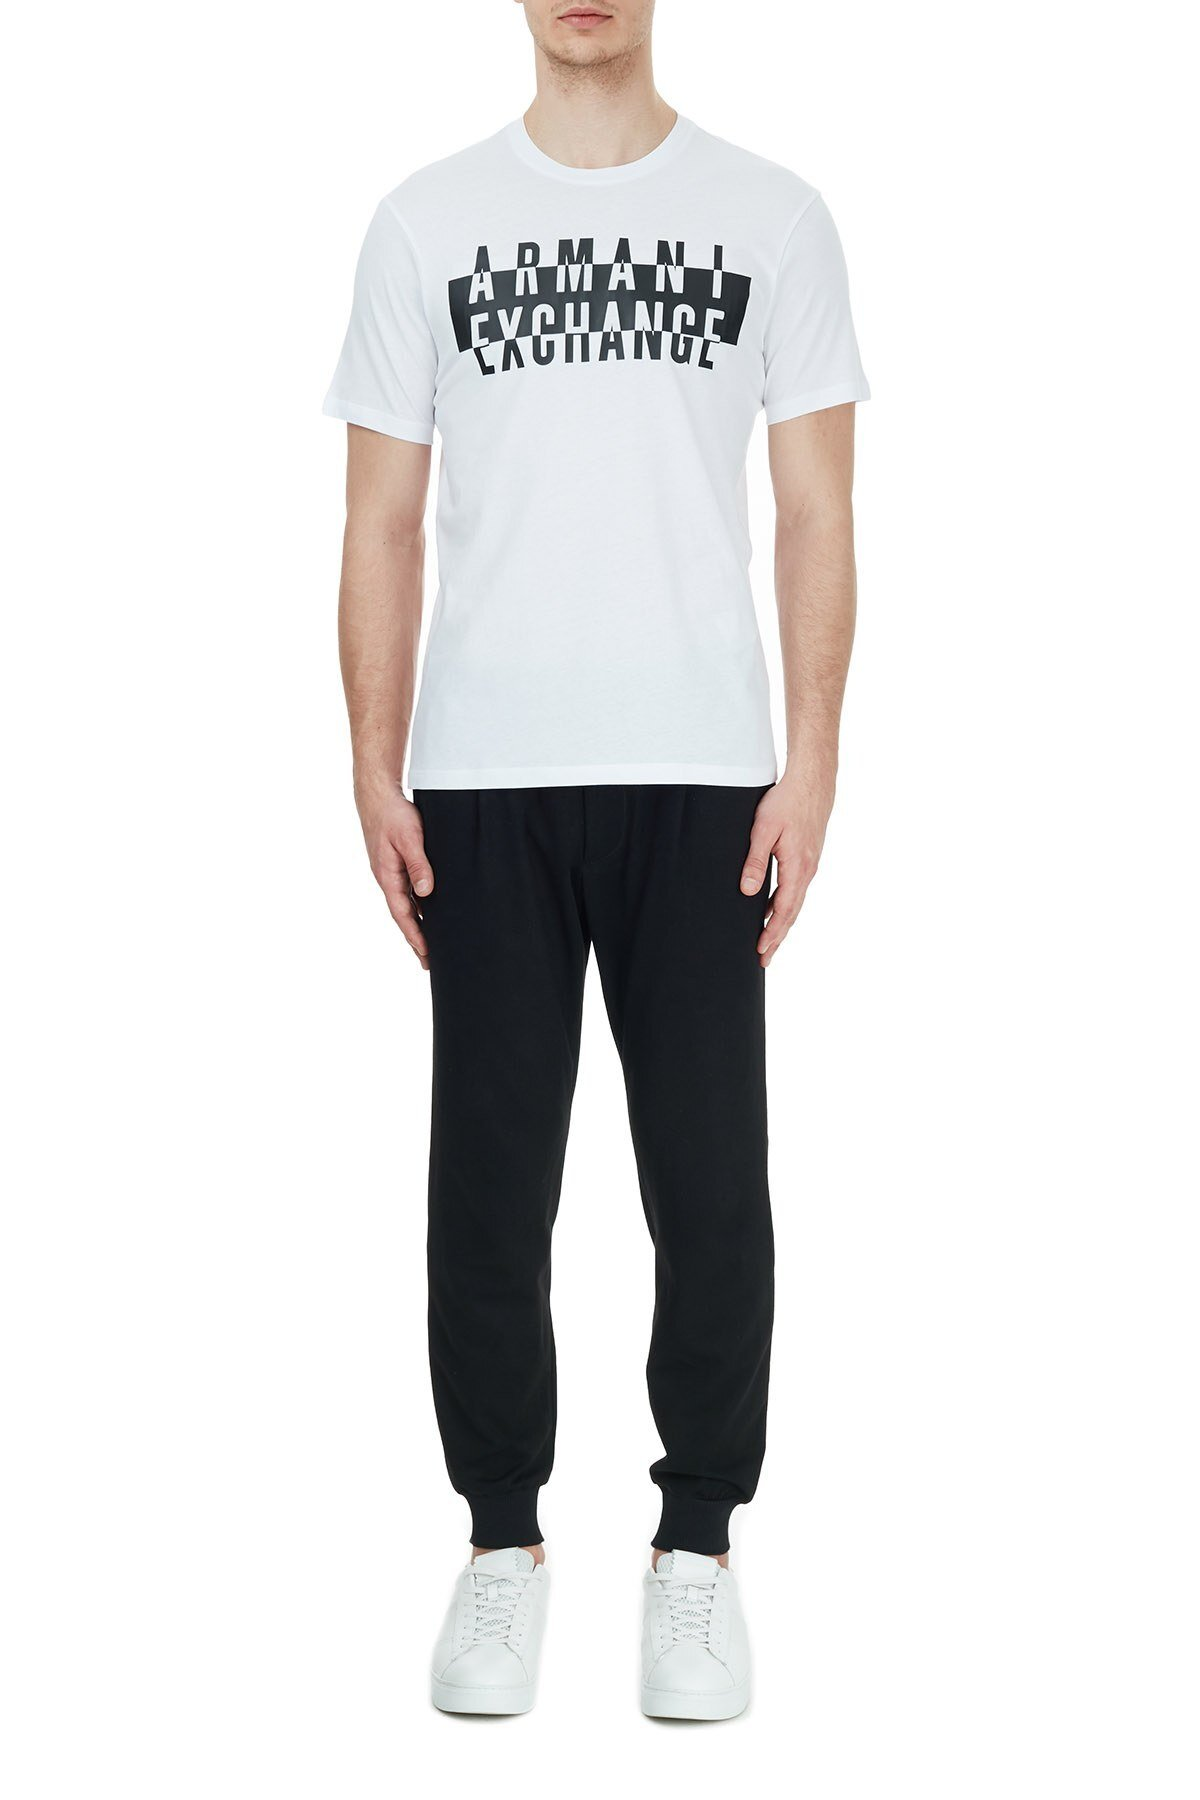 Armani Exchange % 100 Pamuklu Baskılı Bisiklet Yaka Erkek T Shirt 6HZTGD ZJH4Z 1100 BEYAZ